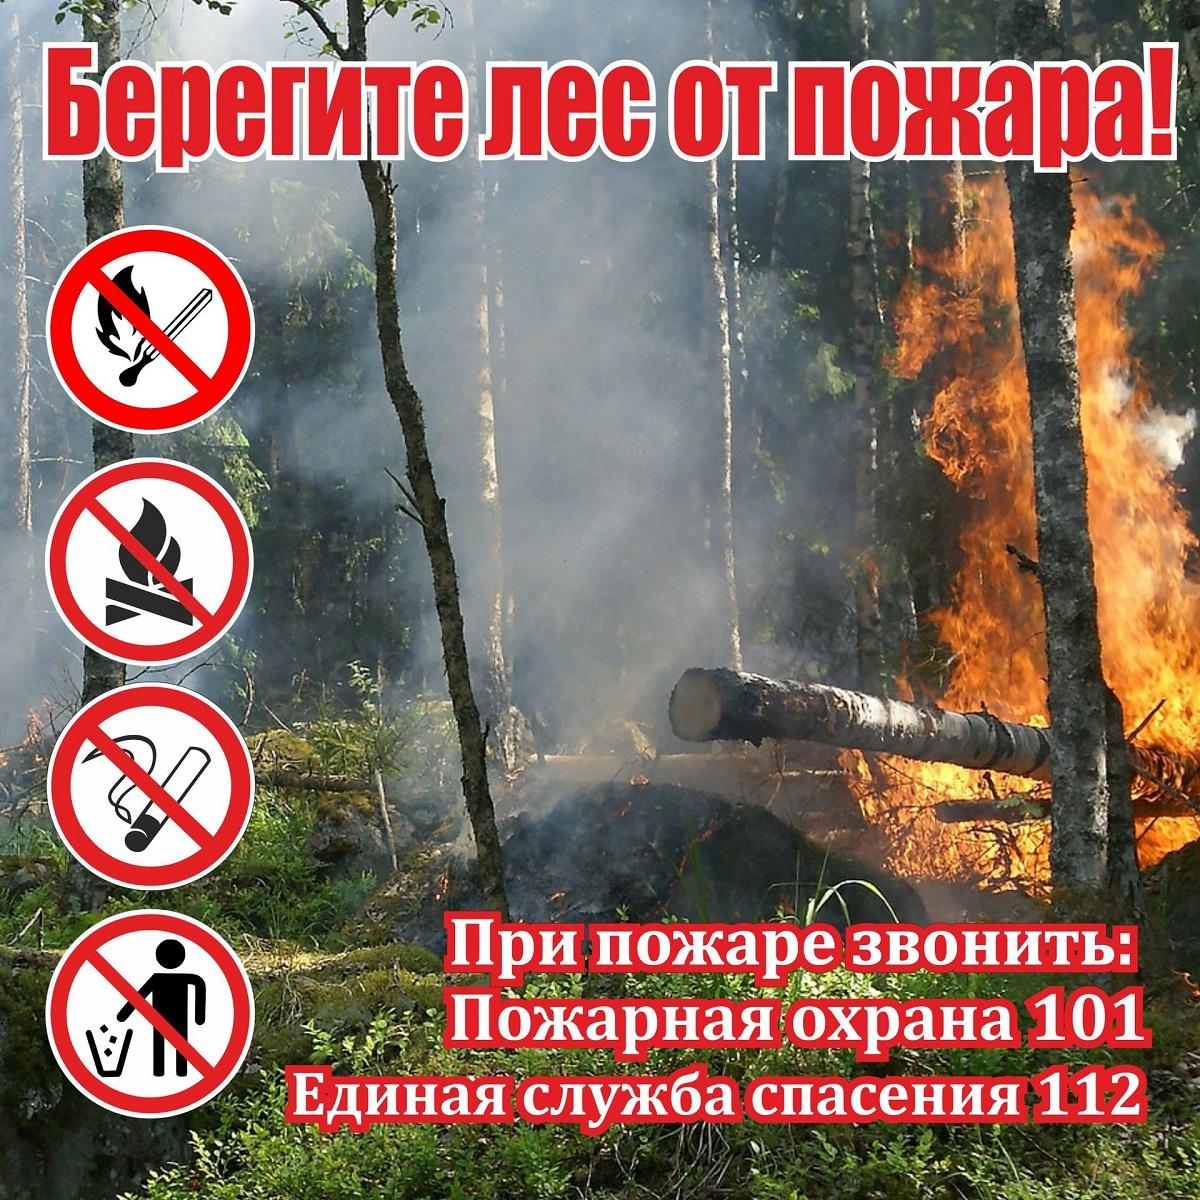 http://kolomnagrad.ru/uploads/posts/2019-04/1556621027_anshlag_no4.jpg